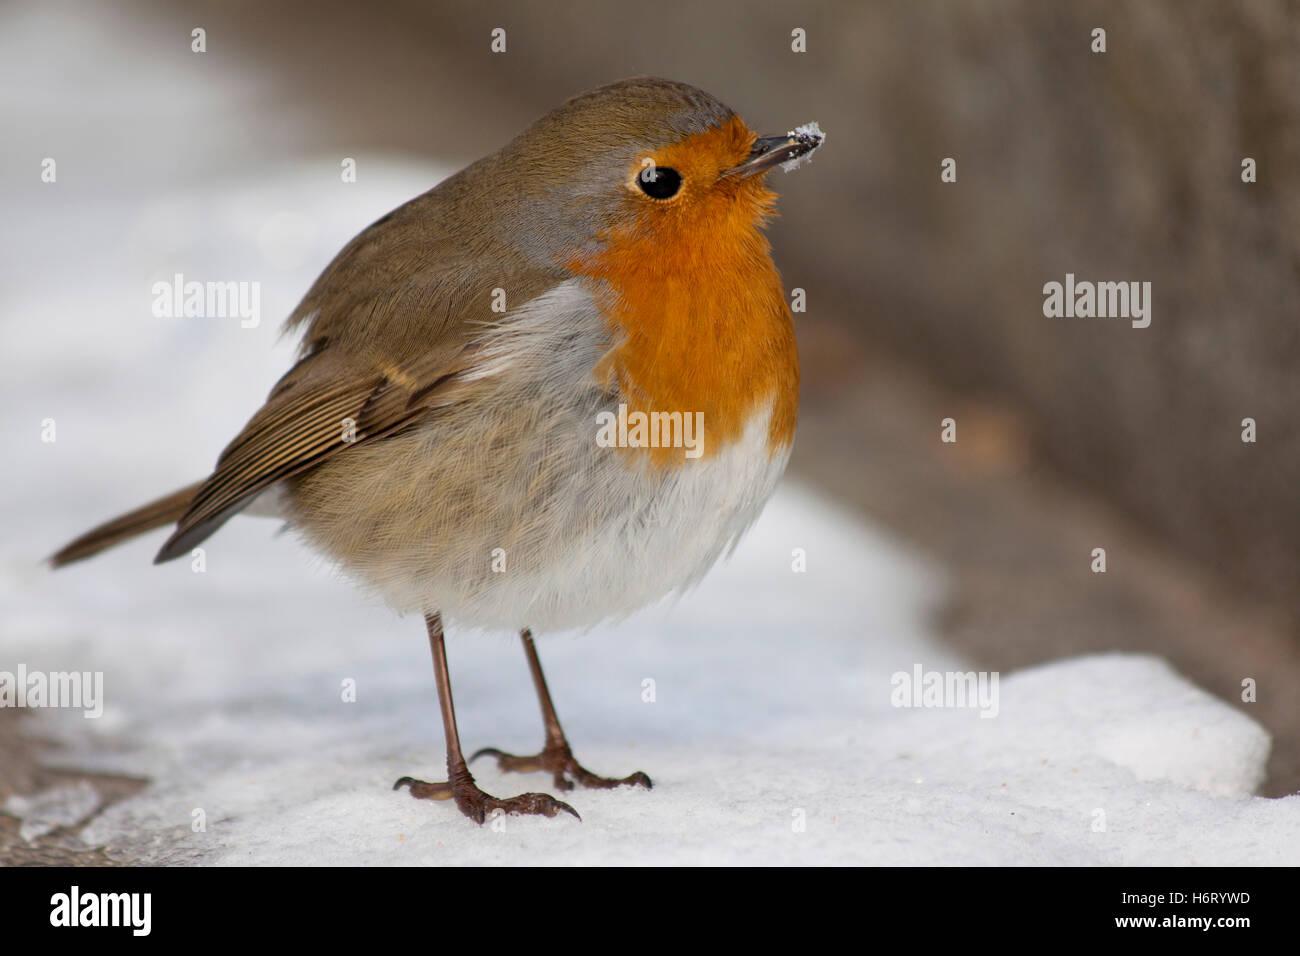 birds - Stock Image